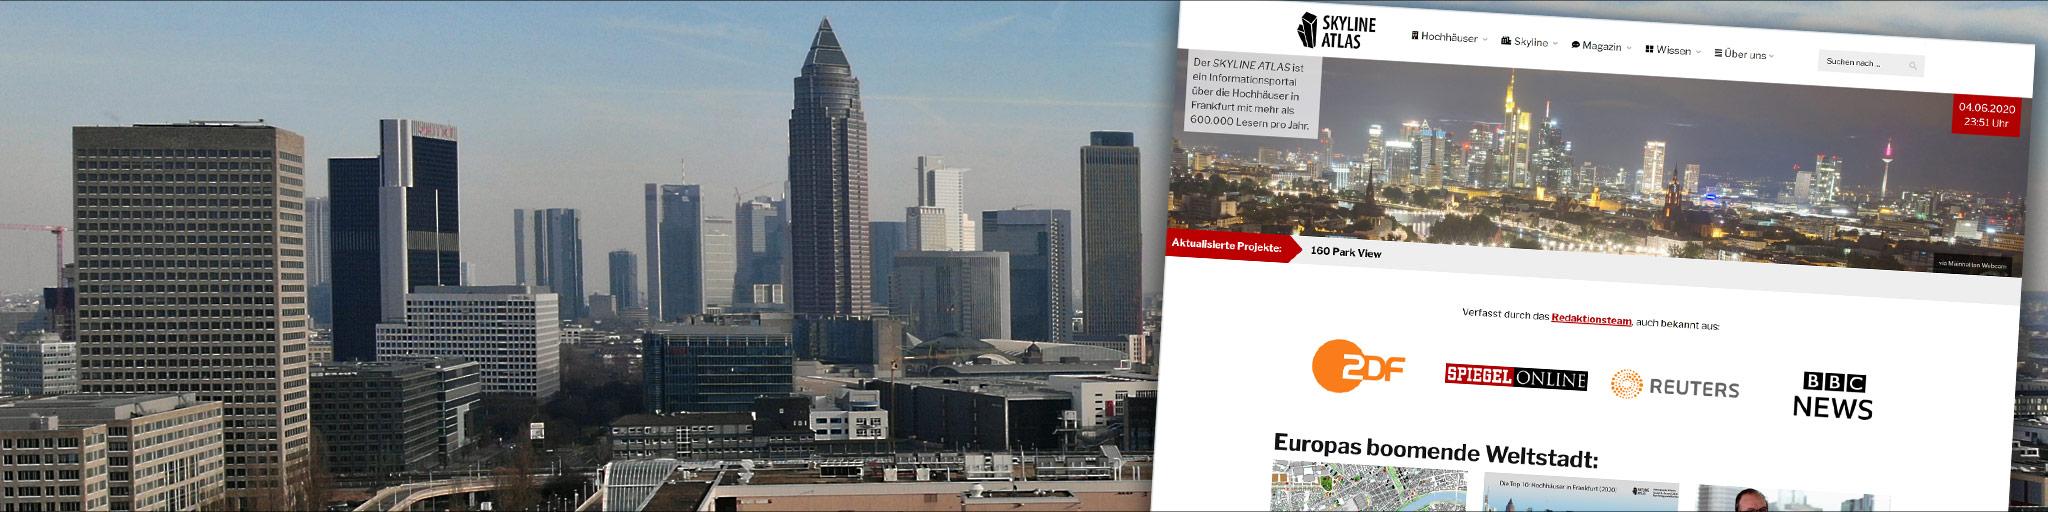 SKYLINE ATLAS Premium Partner - Onlinewerbung Immobilien - Architekturportal Frankfurt - Onlinemarketing Portal - Werbeschaltung Immobilien - Werbung Architektur - Werbung für Immobilien